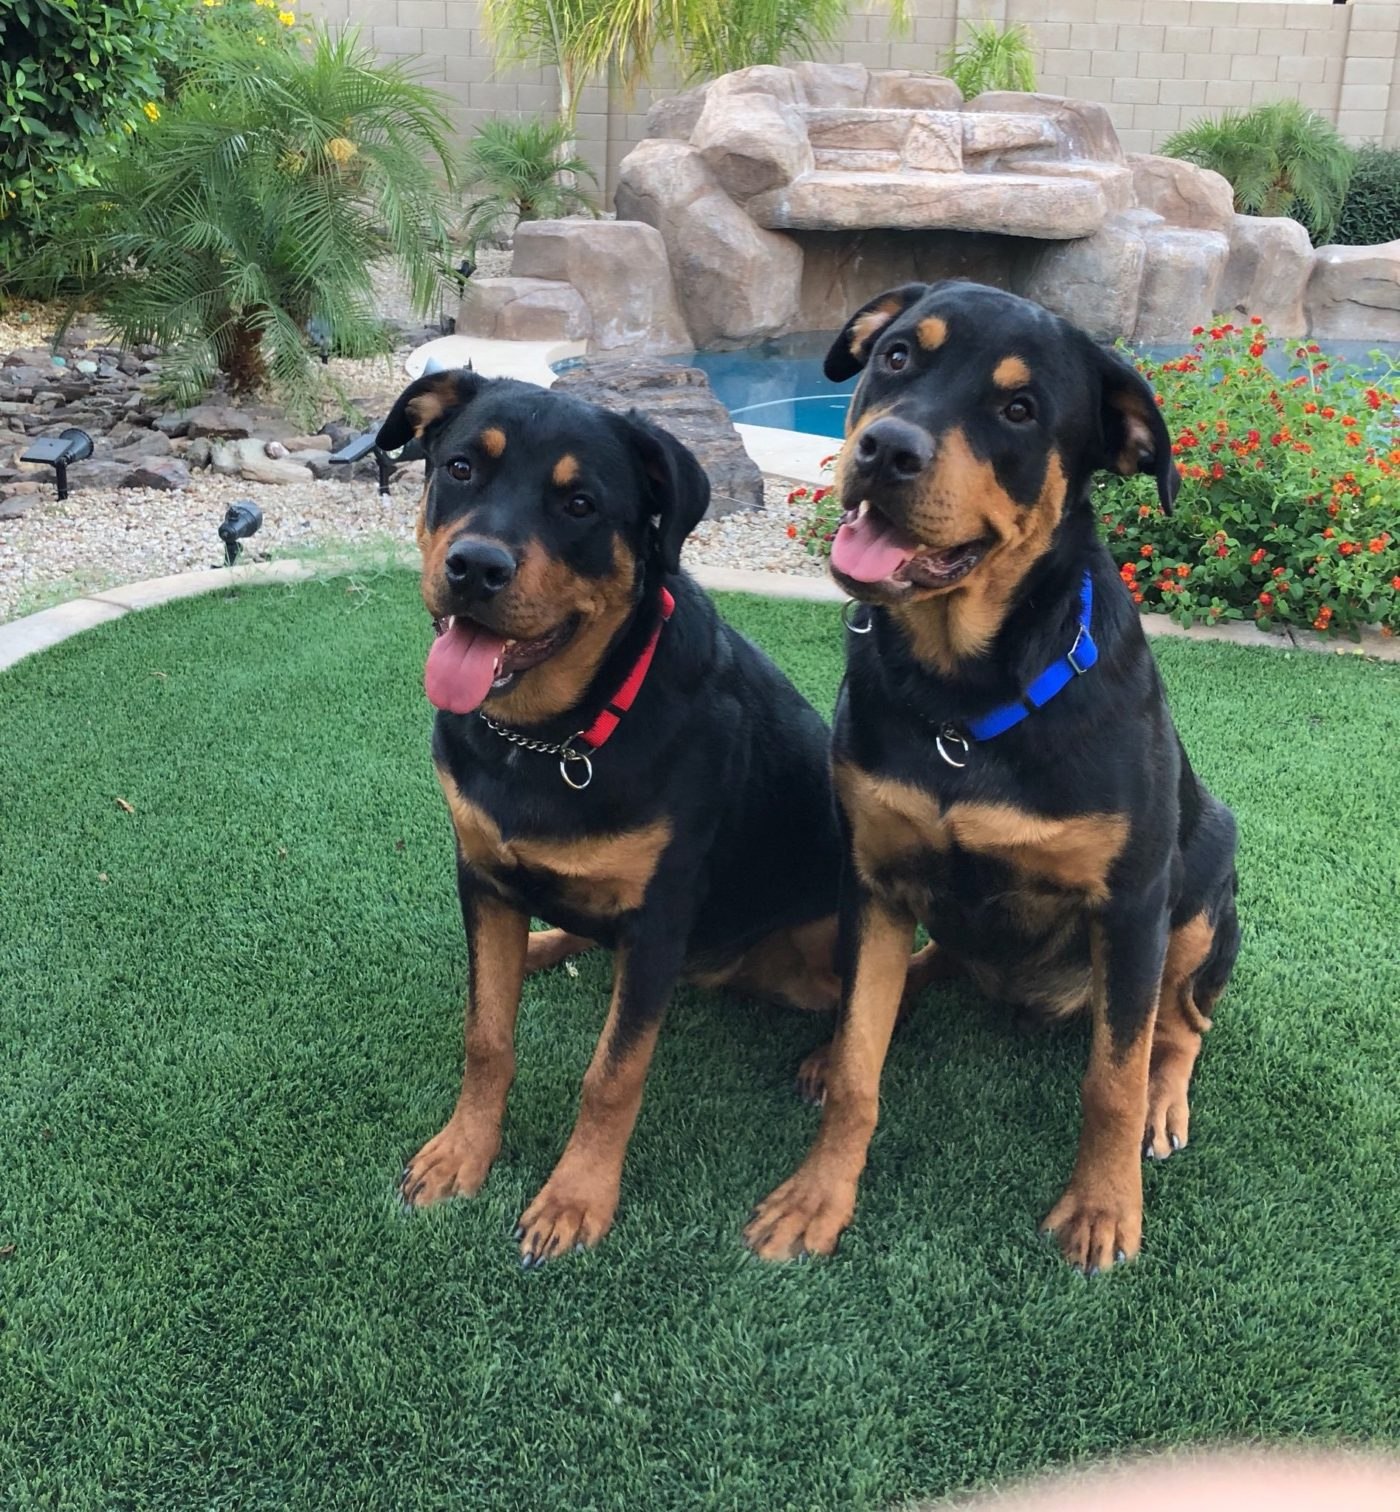 #rottweilertraining #dogsofbarkbusters #dogtraininggoodyear #bestdogtrainerphoenix